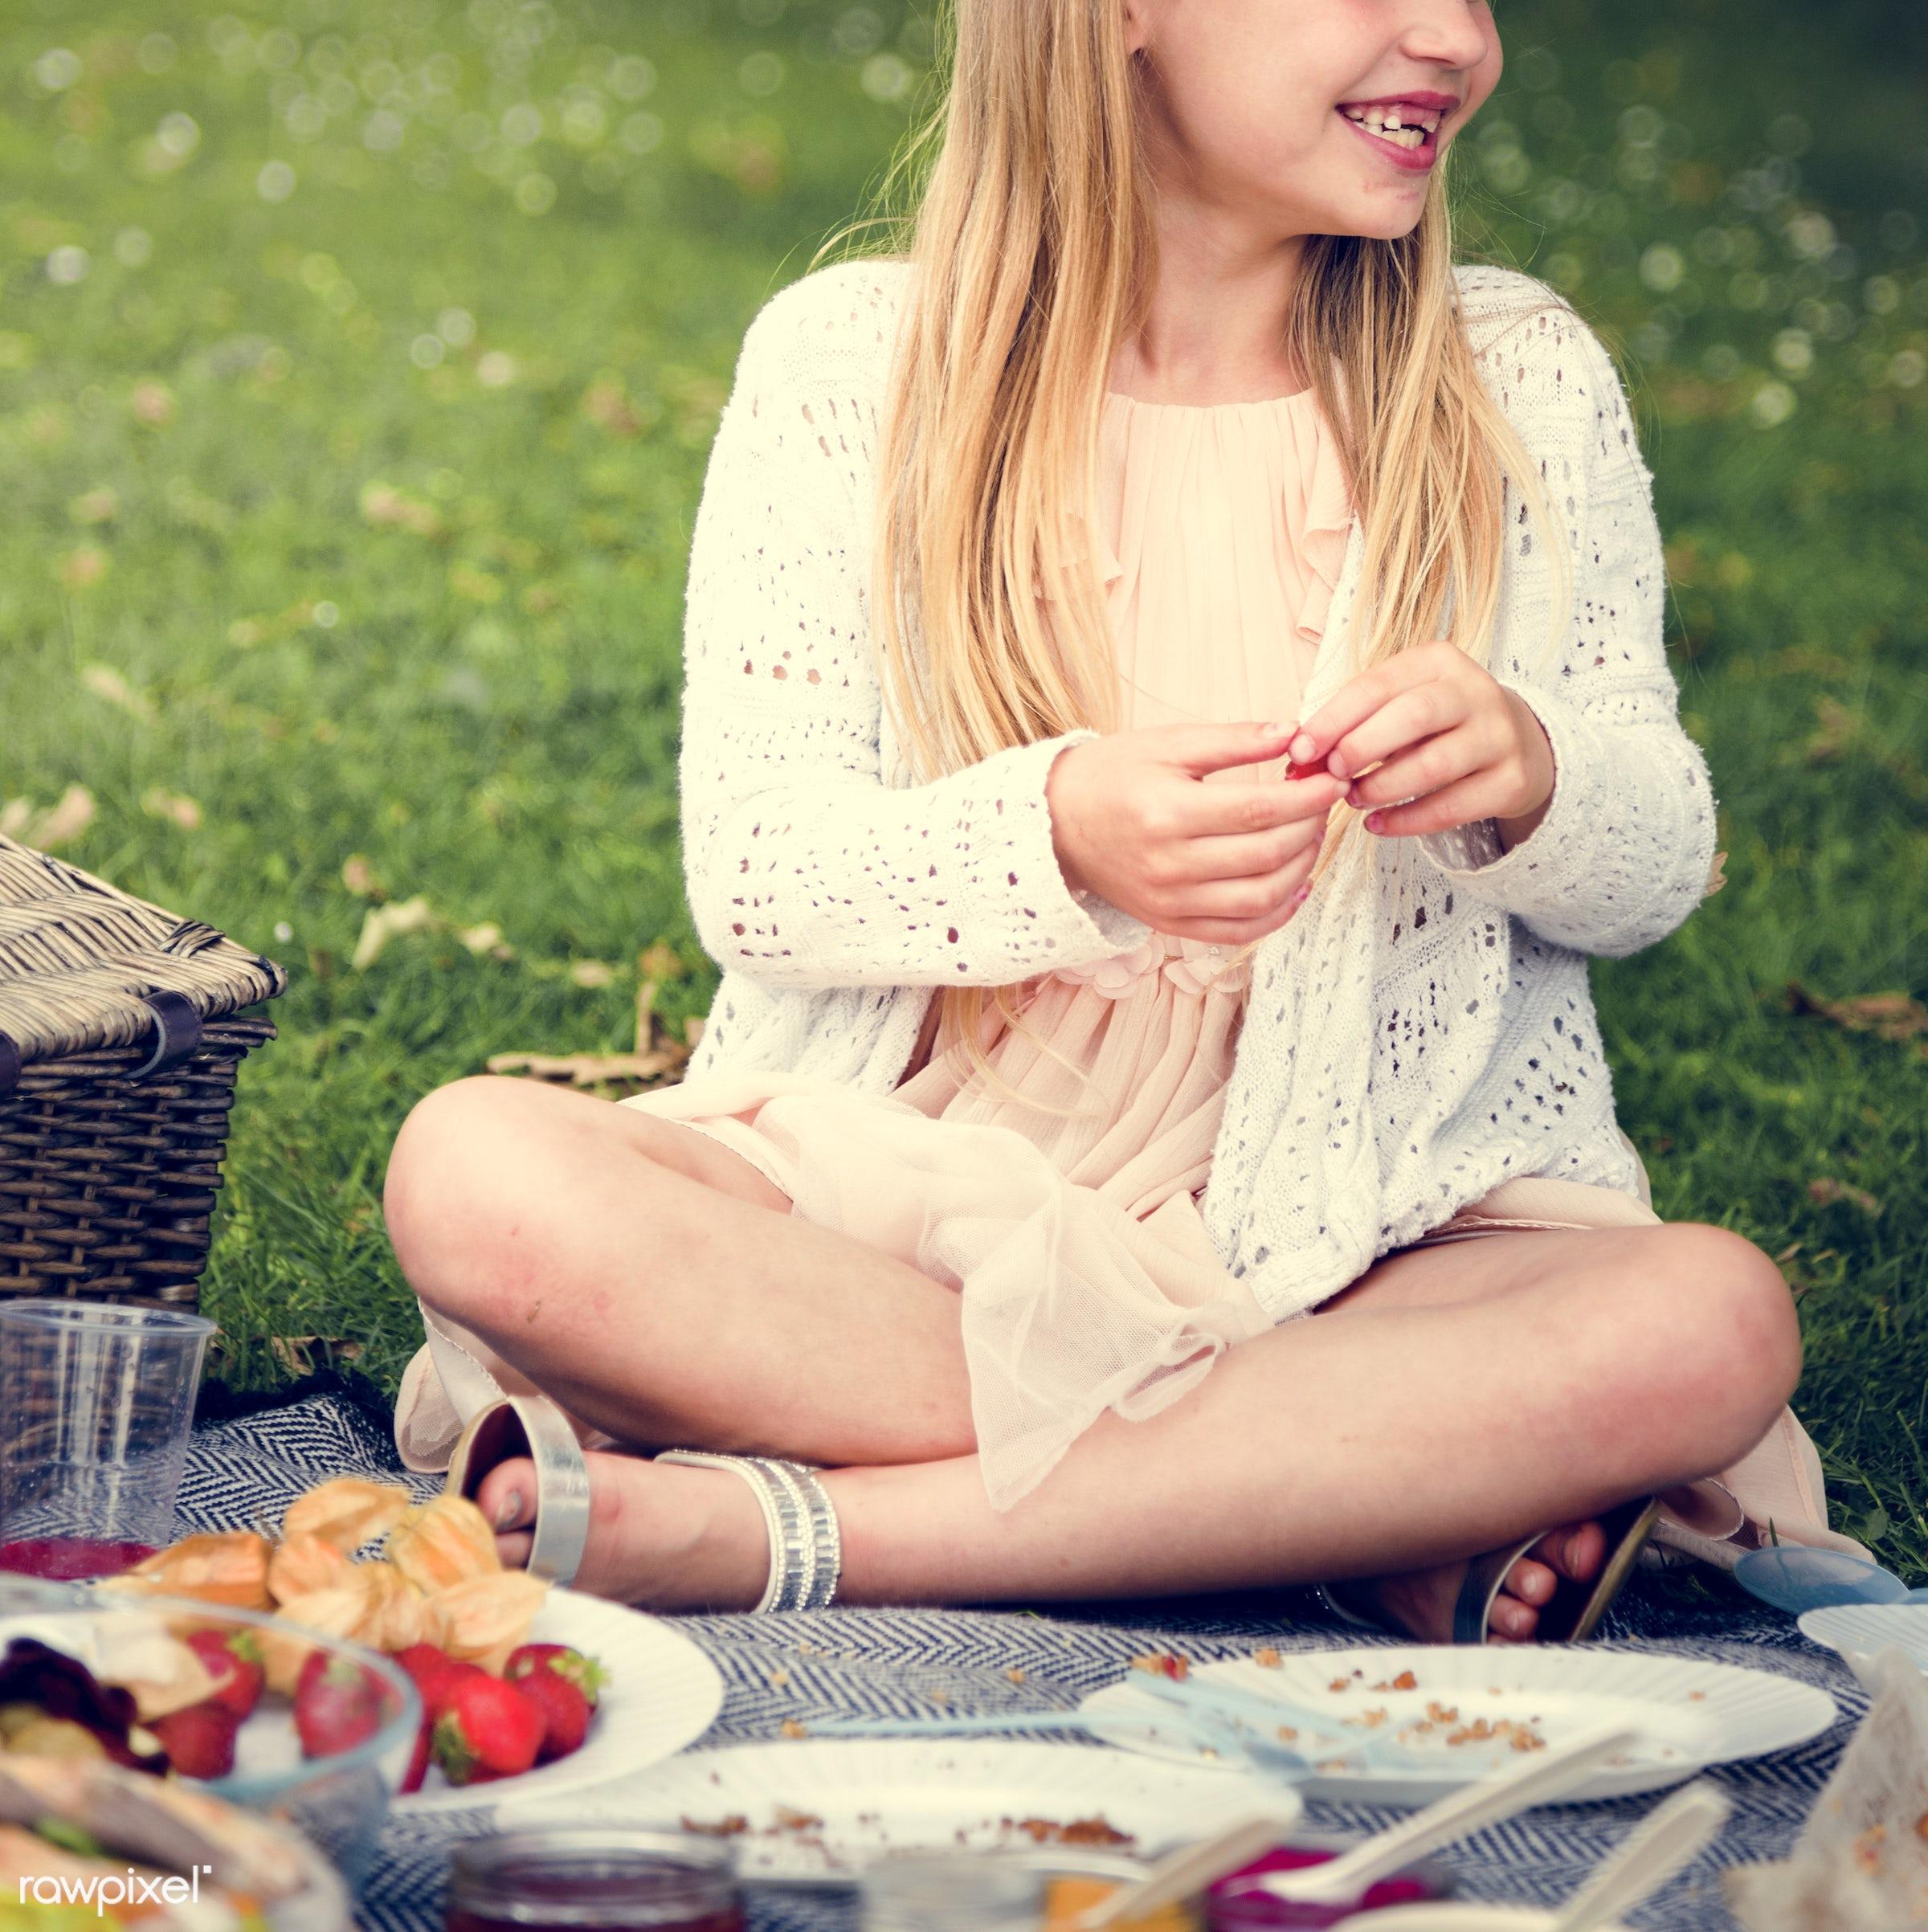 cheerful, child, childhood, enjoyment, environmental, field, food, fruit, fun, garden, girl, grass, happiness, holiday,...